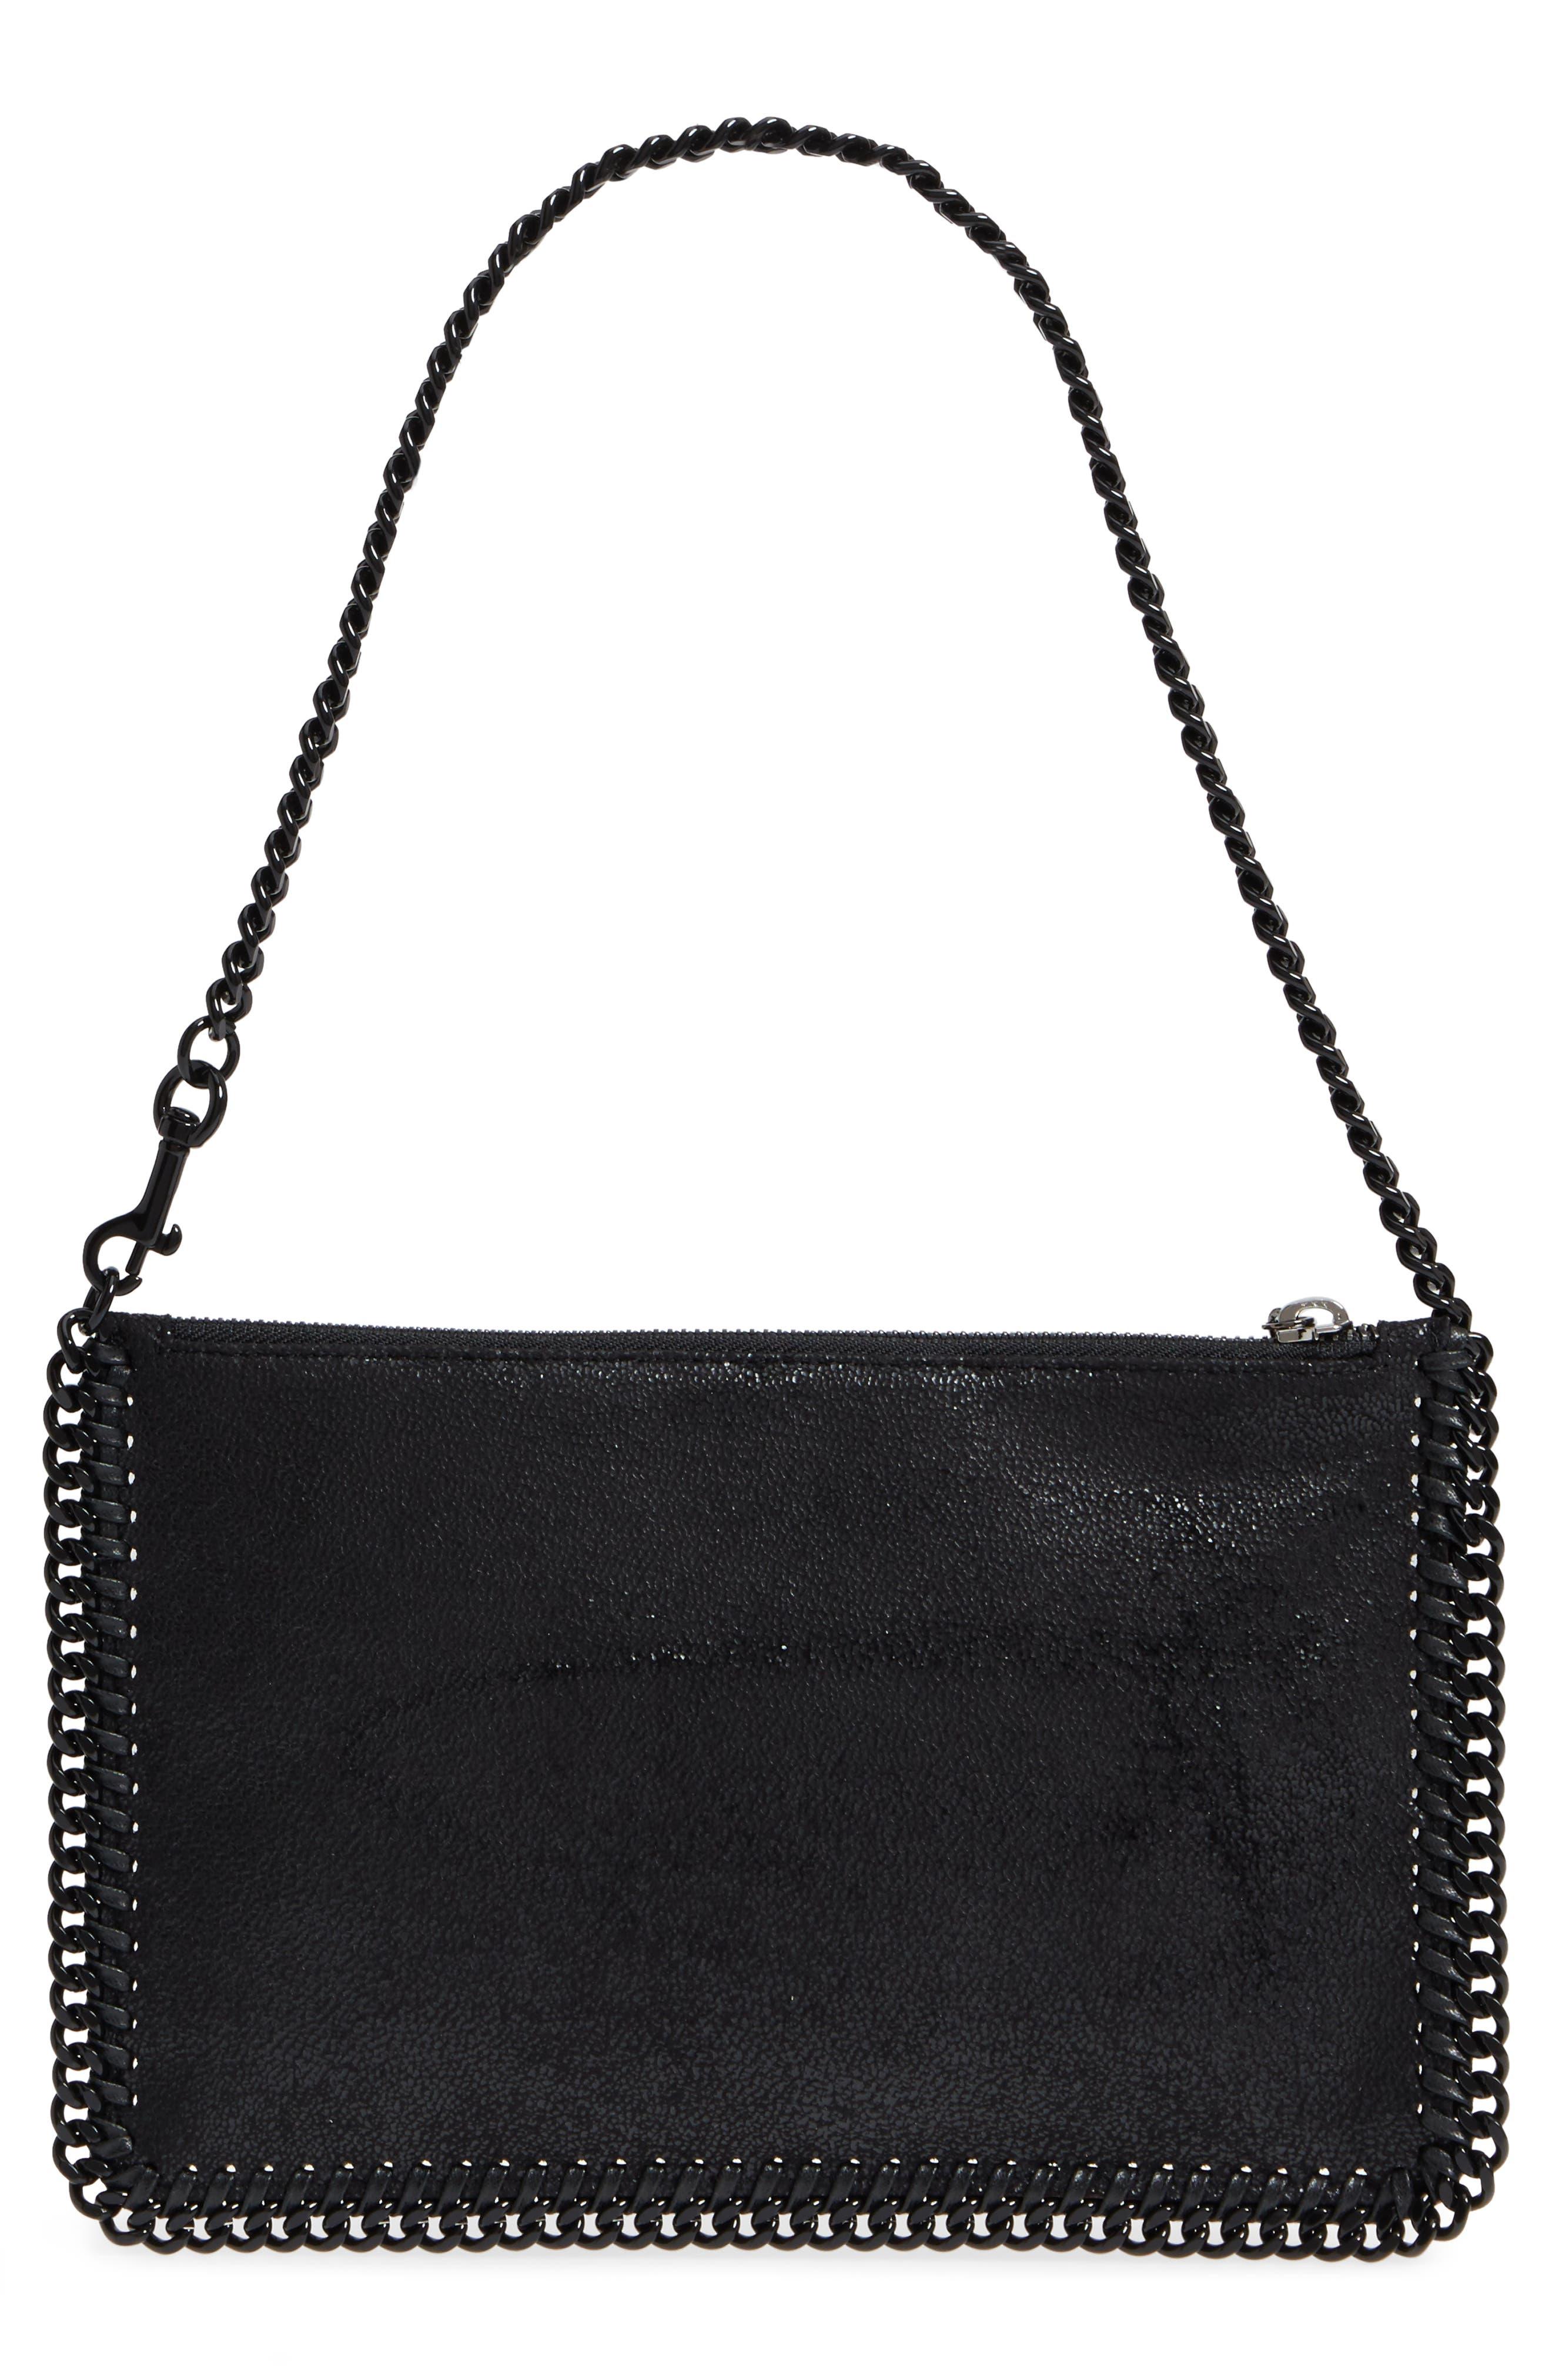 STELLA MCCARTNEY, Falabella Shaggy Deer Faux Leather Handbag, Alternate thumbnail 3, color, 001